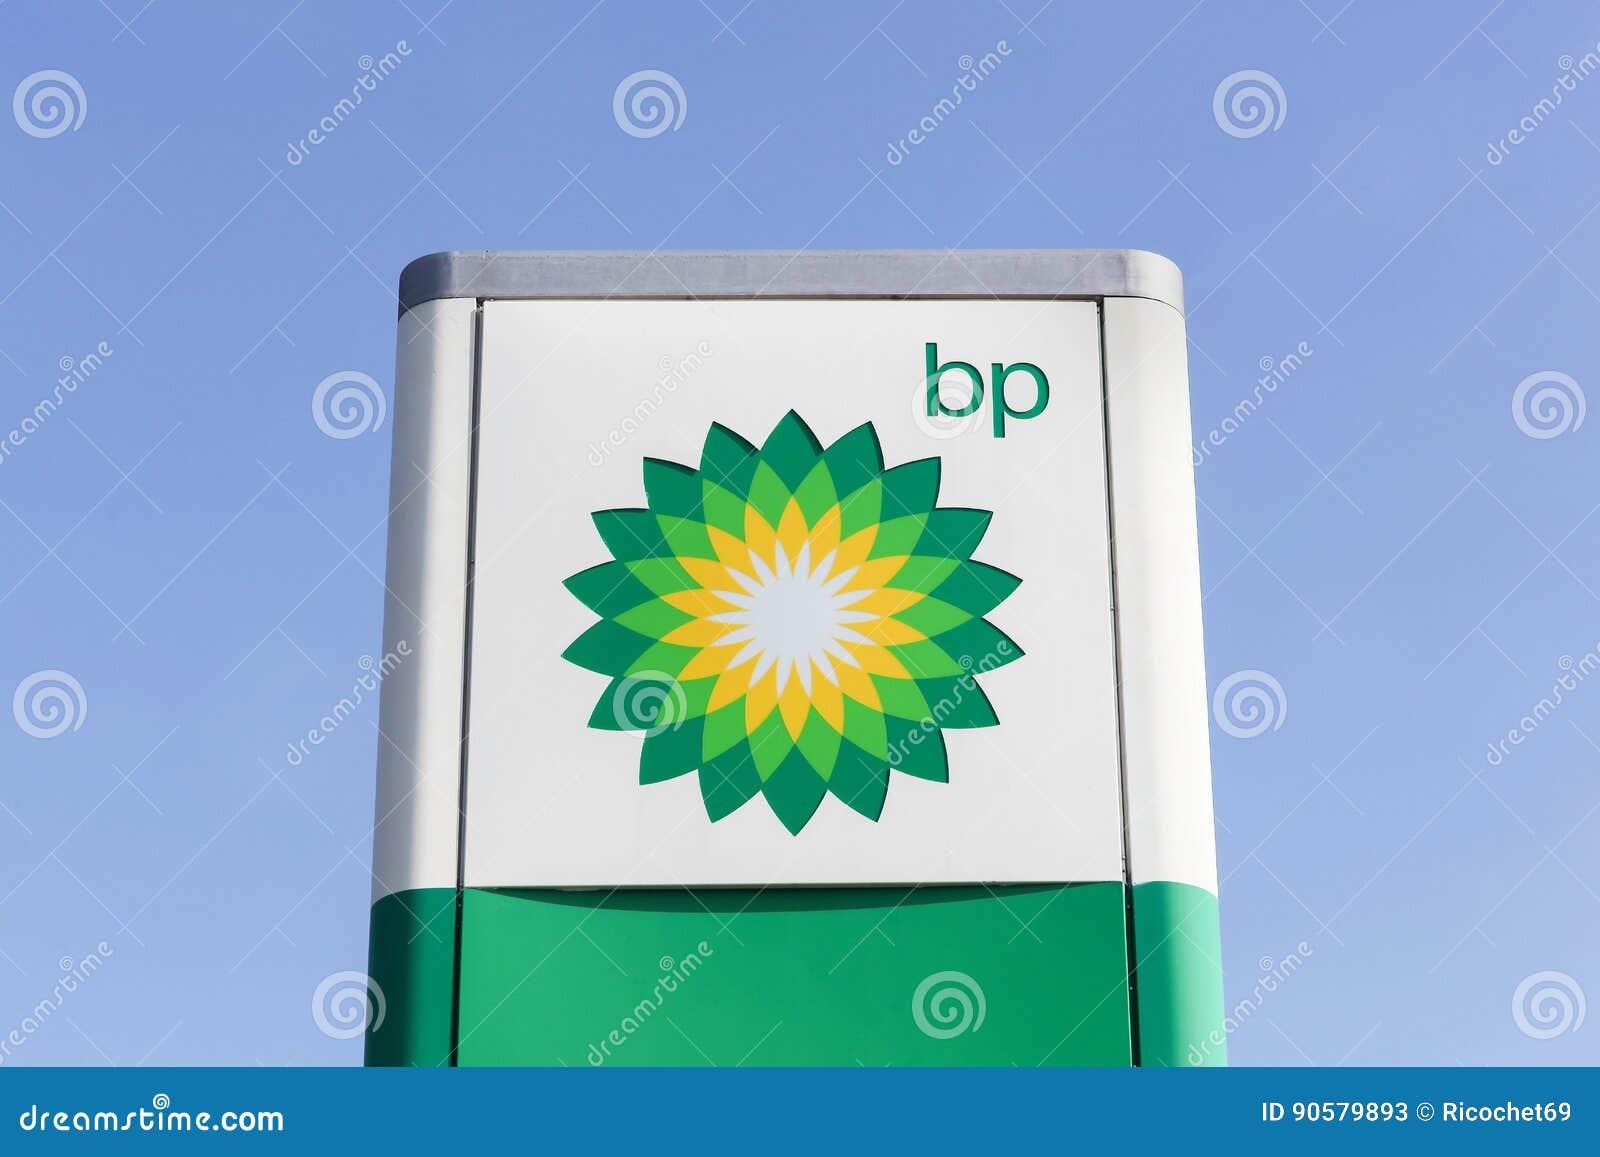 Bp Logo On A Panel Editorial Stock Photo Image Of British 90579893